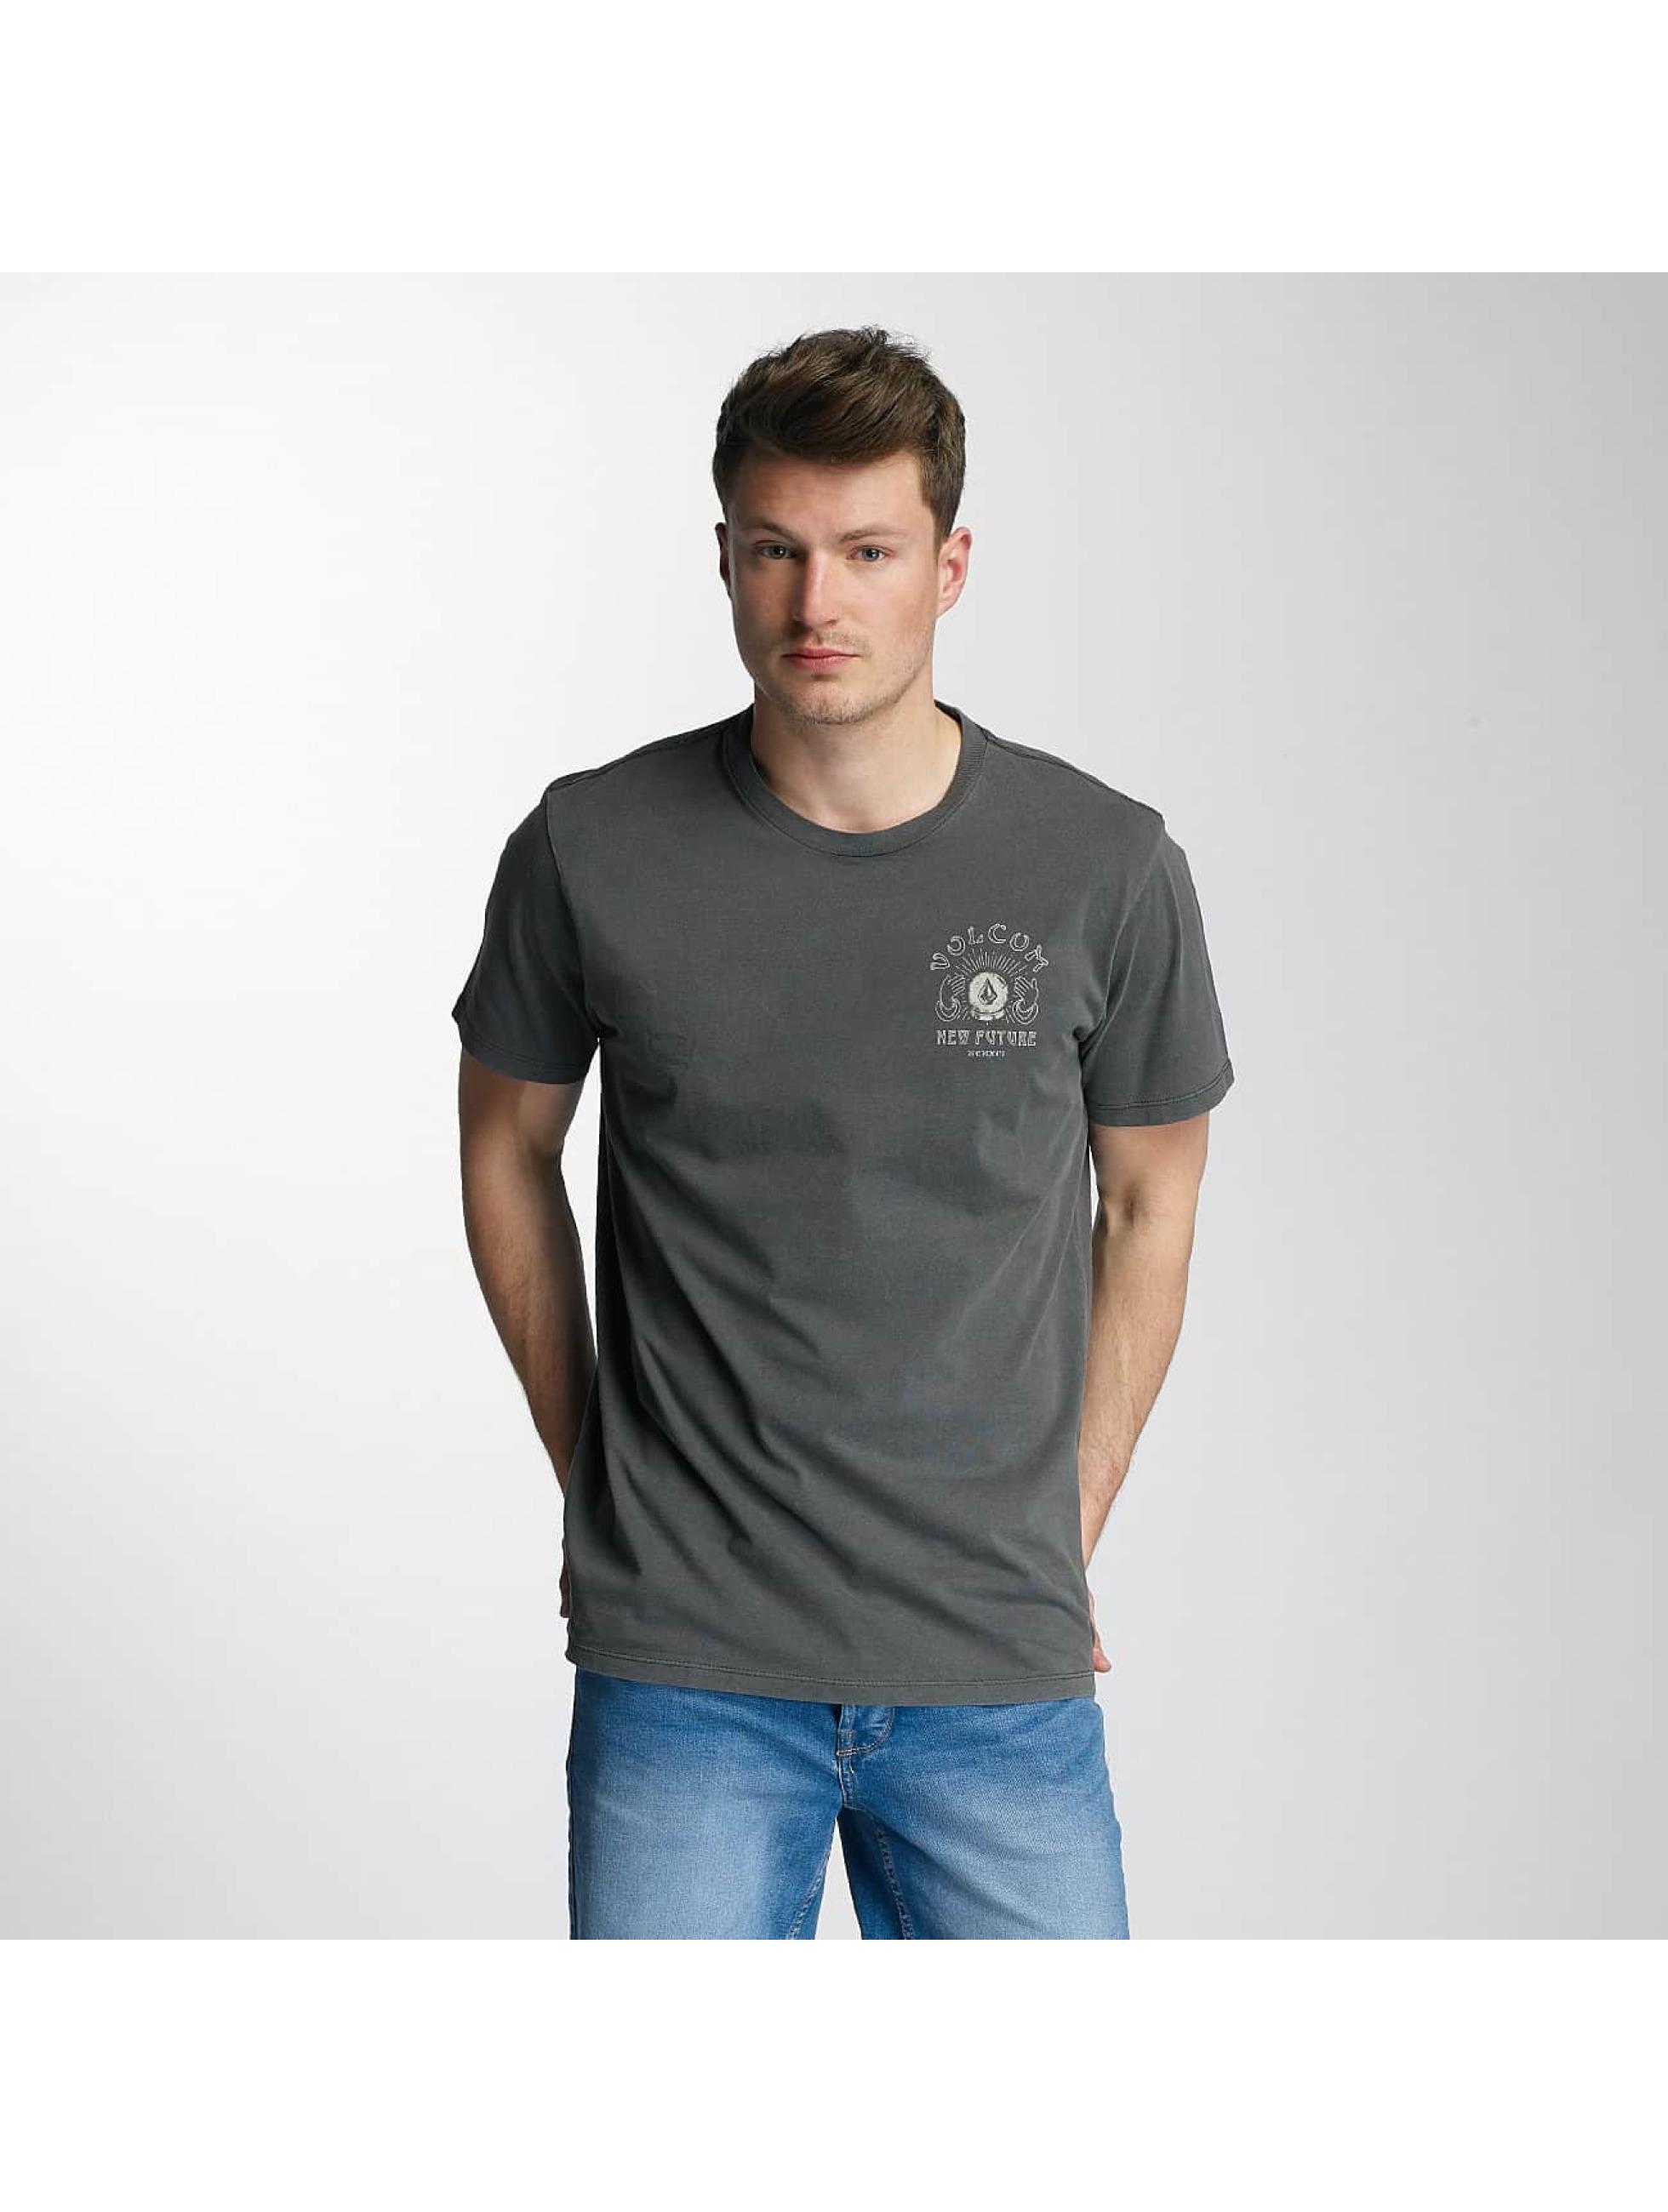 Volcom Männer T-Shirt New Future in grau